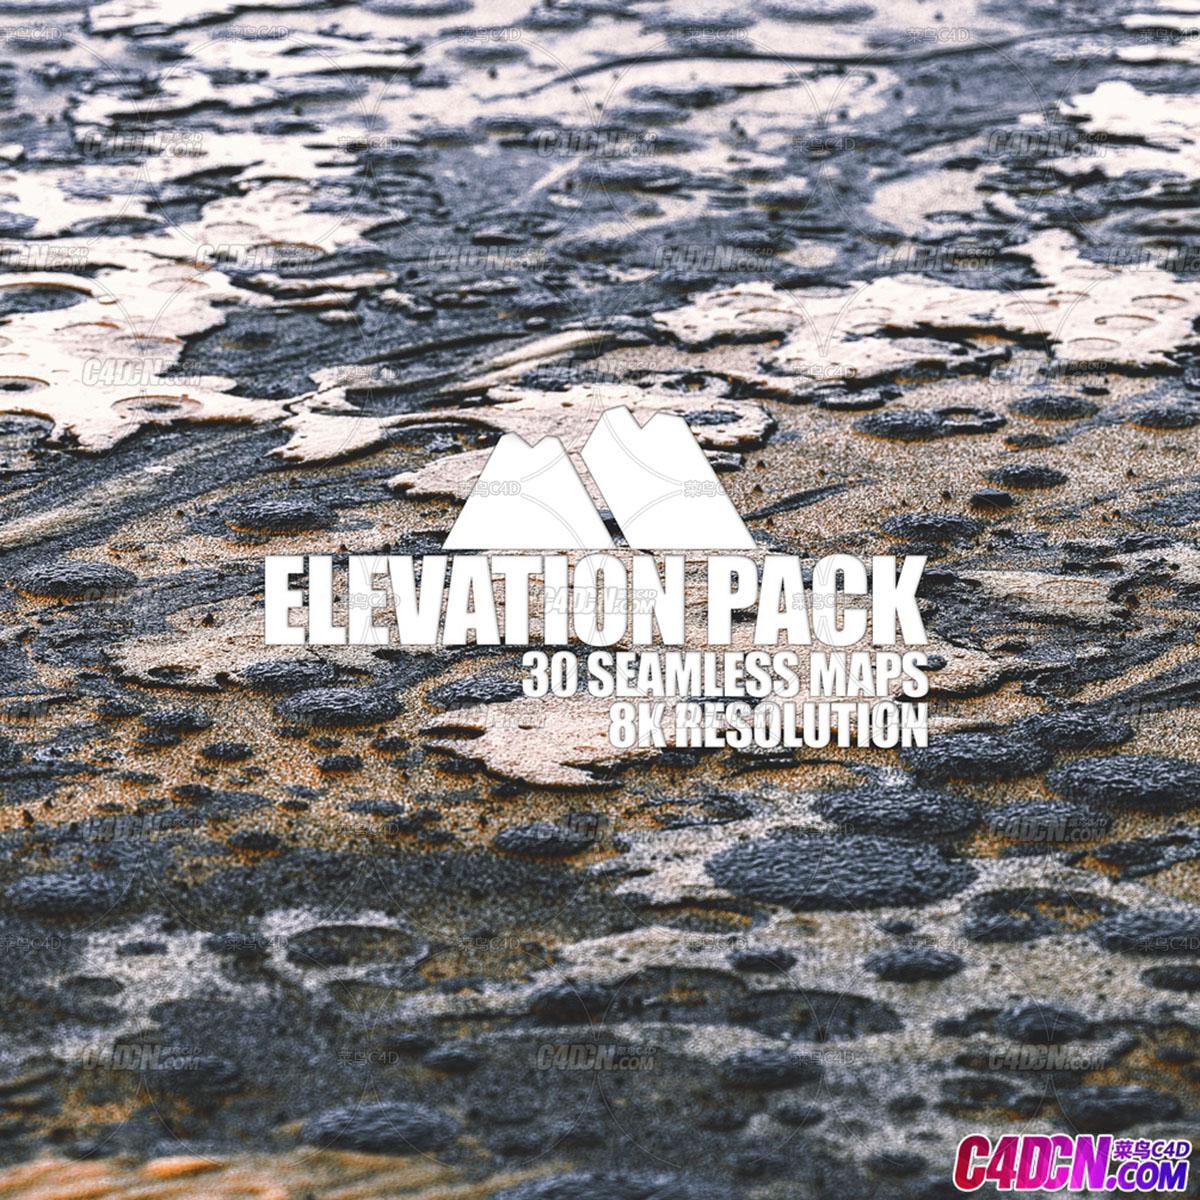 8K分辨率C4D地形置换材质贴图素材合集 Elevation Pack - Highmaps library